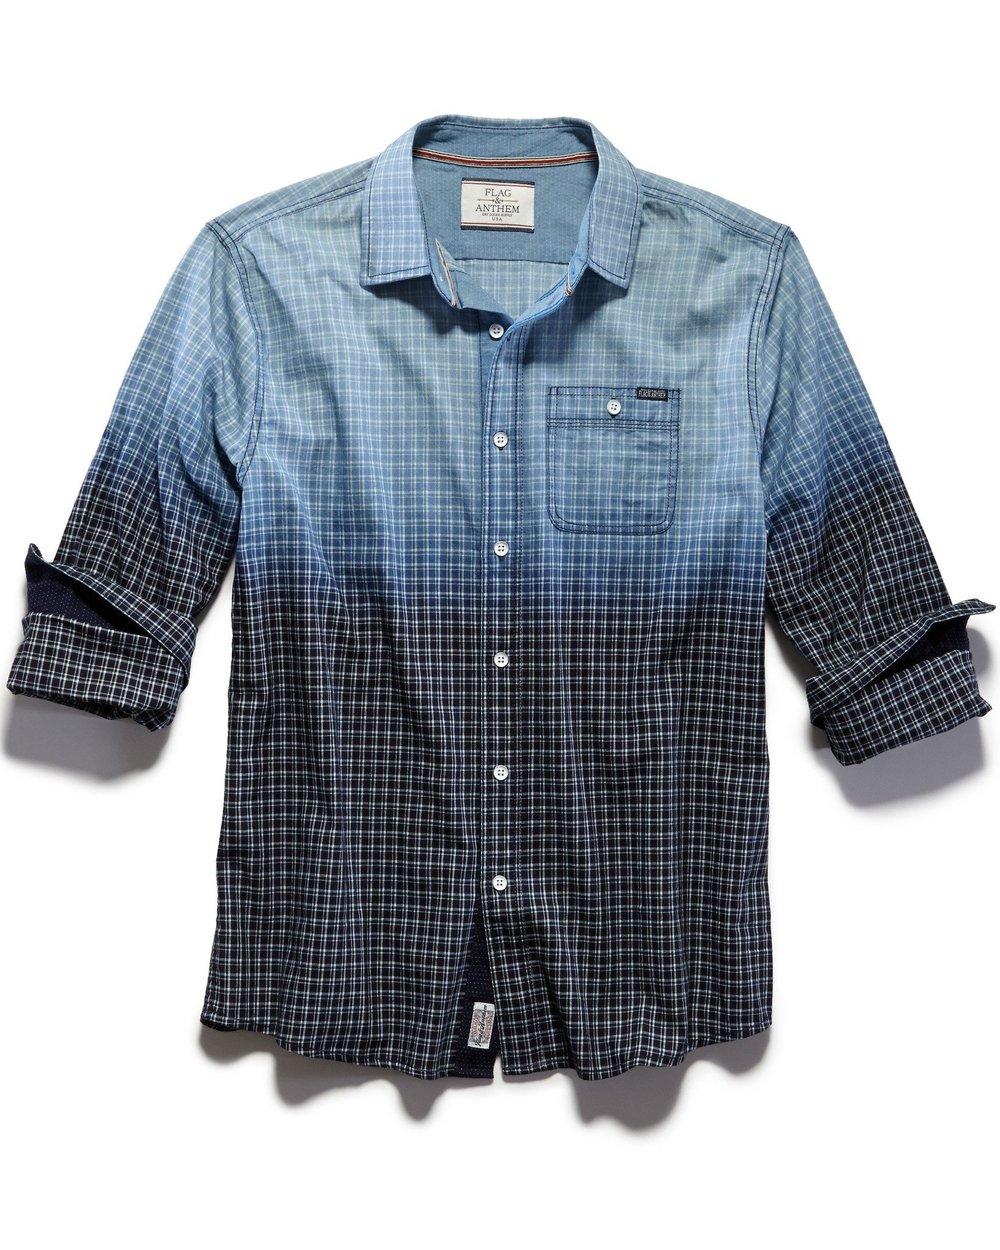 Bradly Shirt $59.50